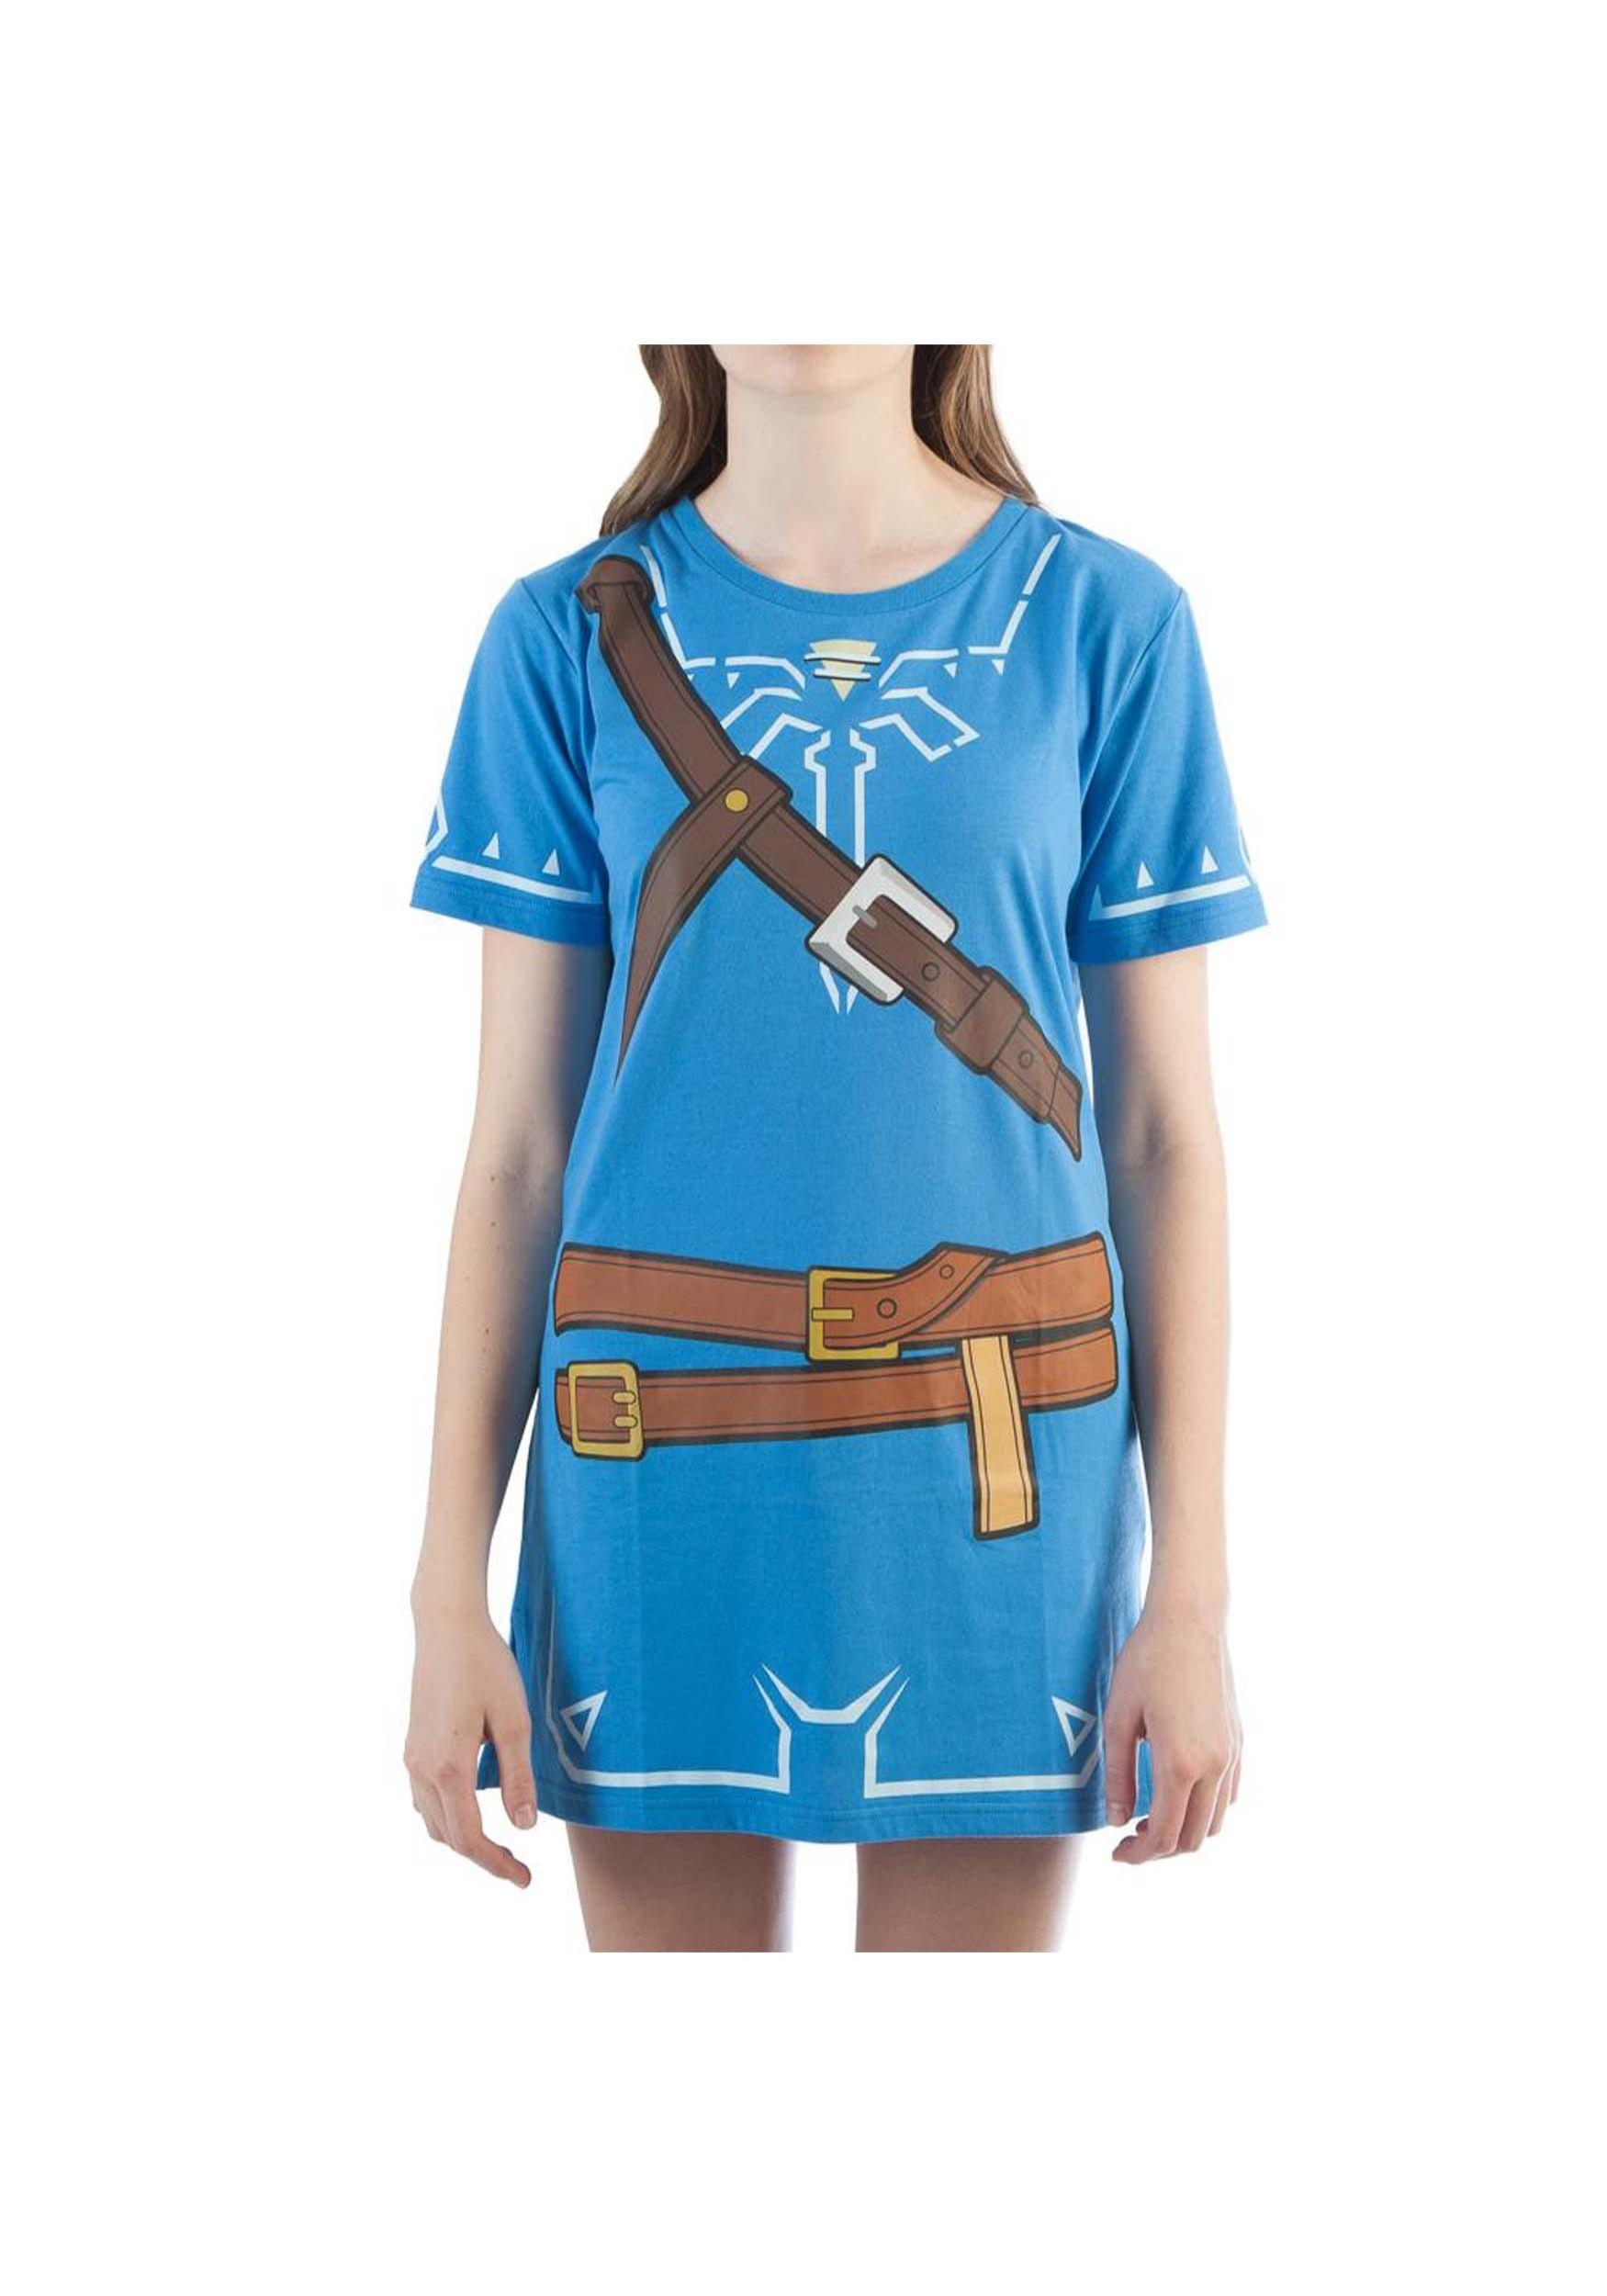 c5835b159 Women's Breath of the Wild Zelda Link Cosplay Costume Tunic